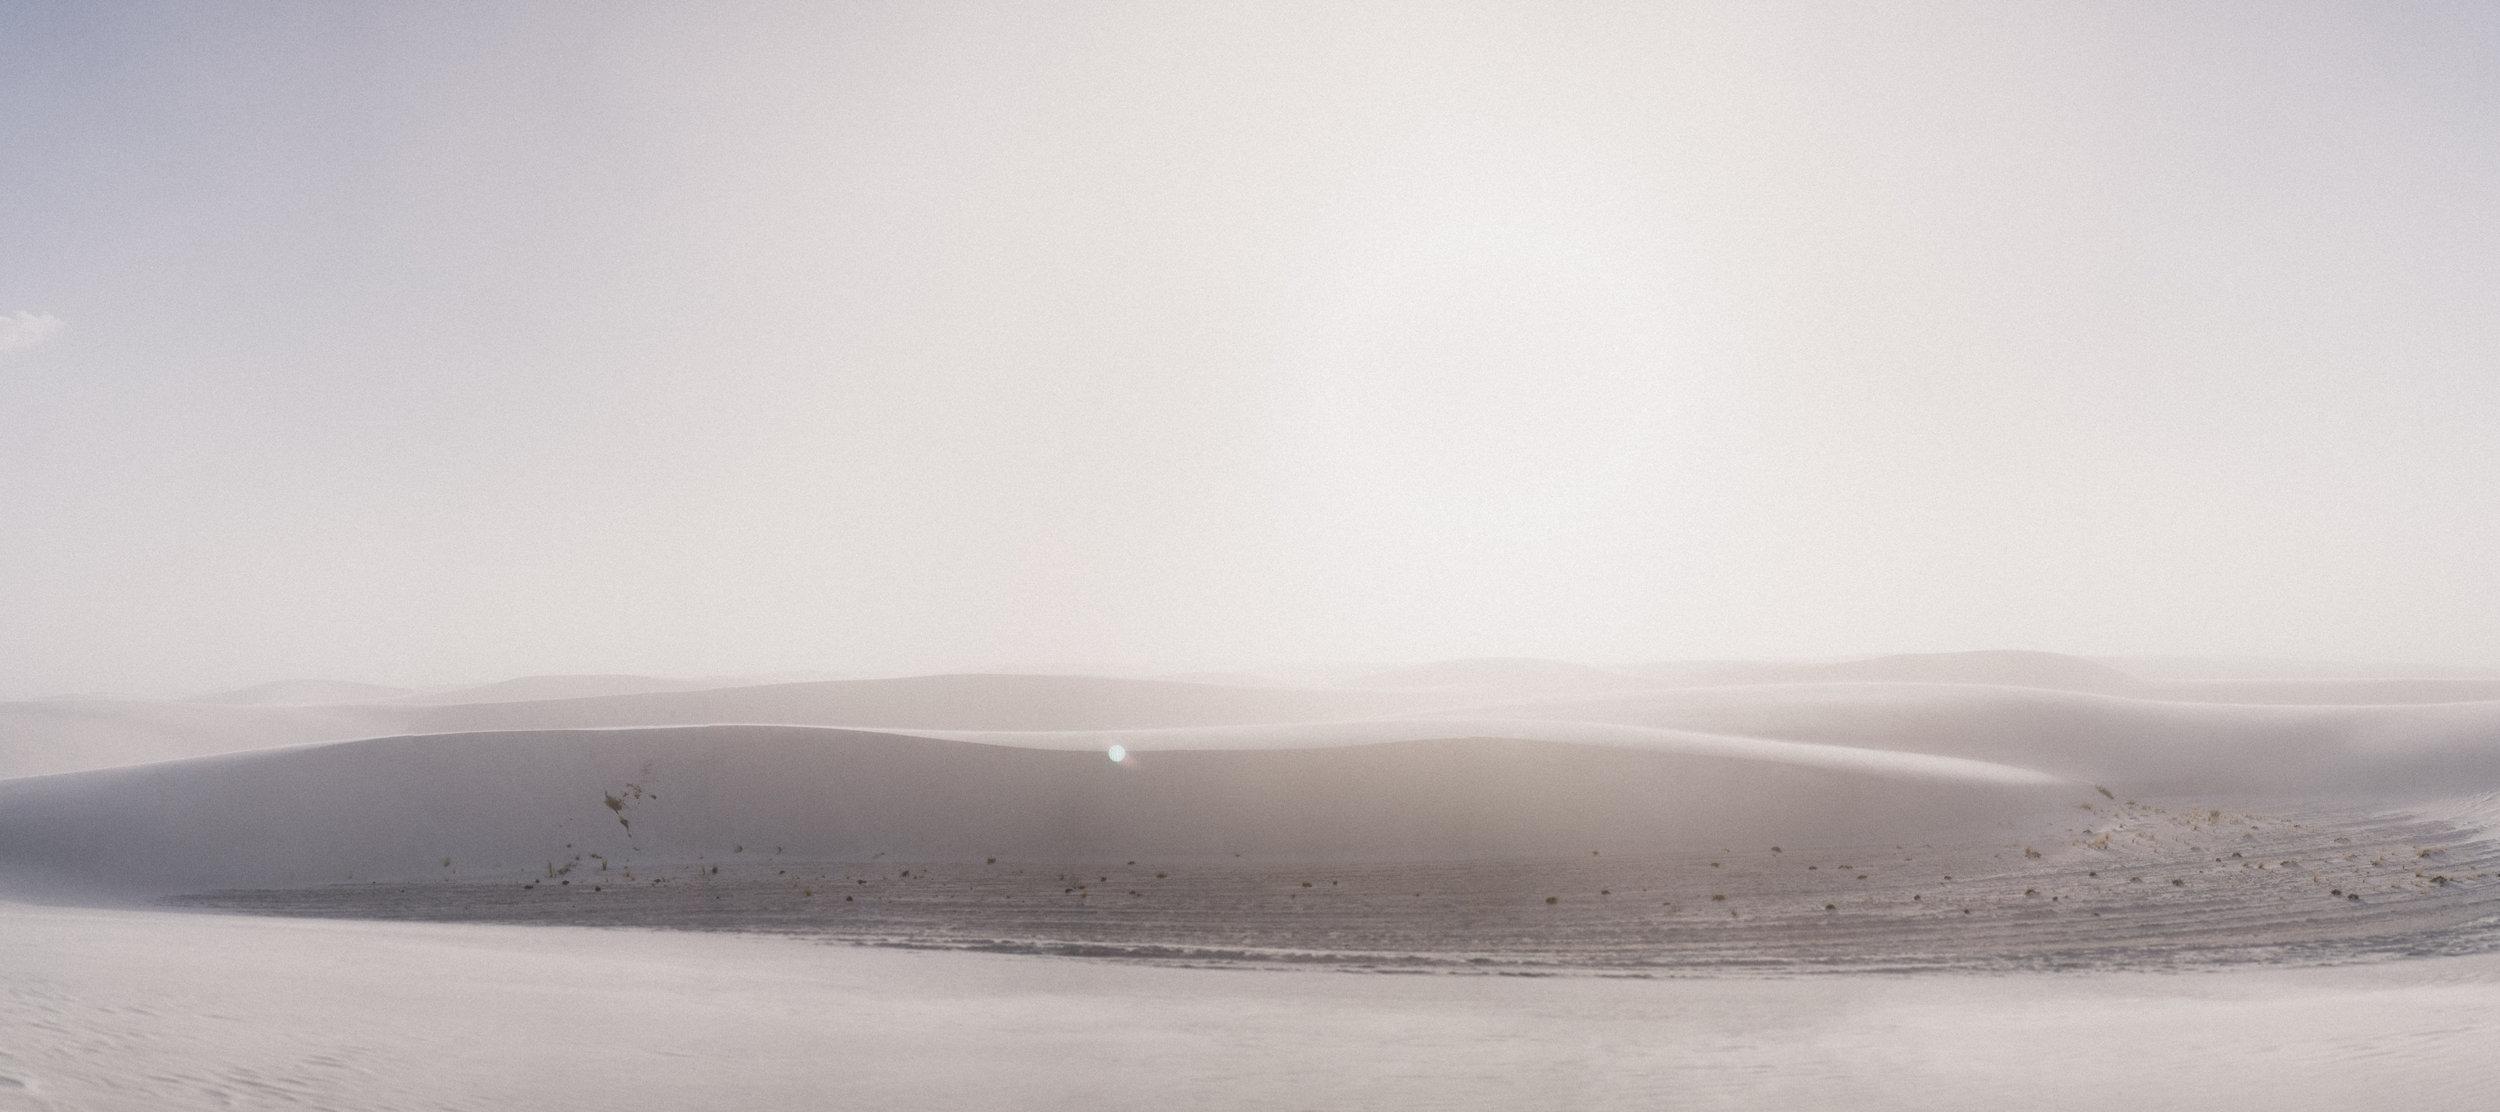 Tony-Gambino-Photography-1148.jpg